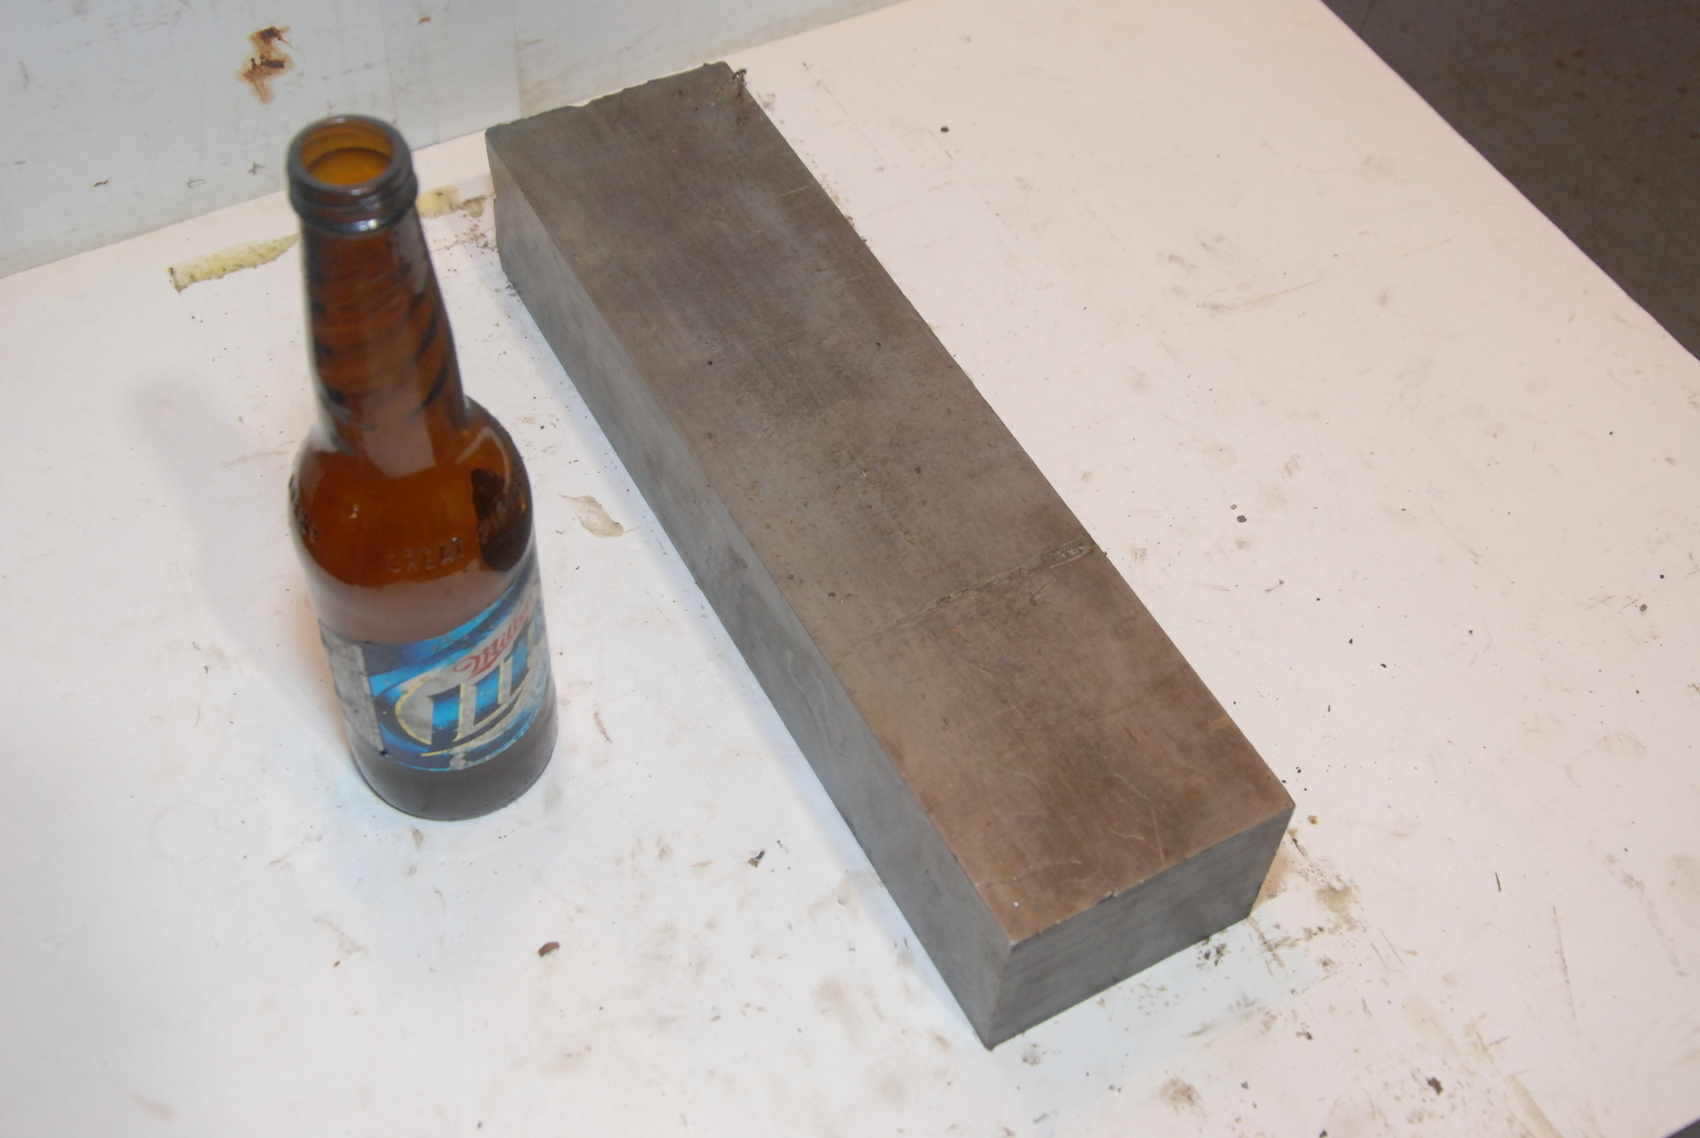 Steel Rectangular Bar for blacksmith anvil,13*3.5*2 3/8,32lbs